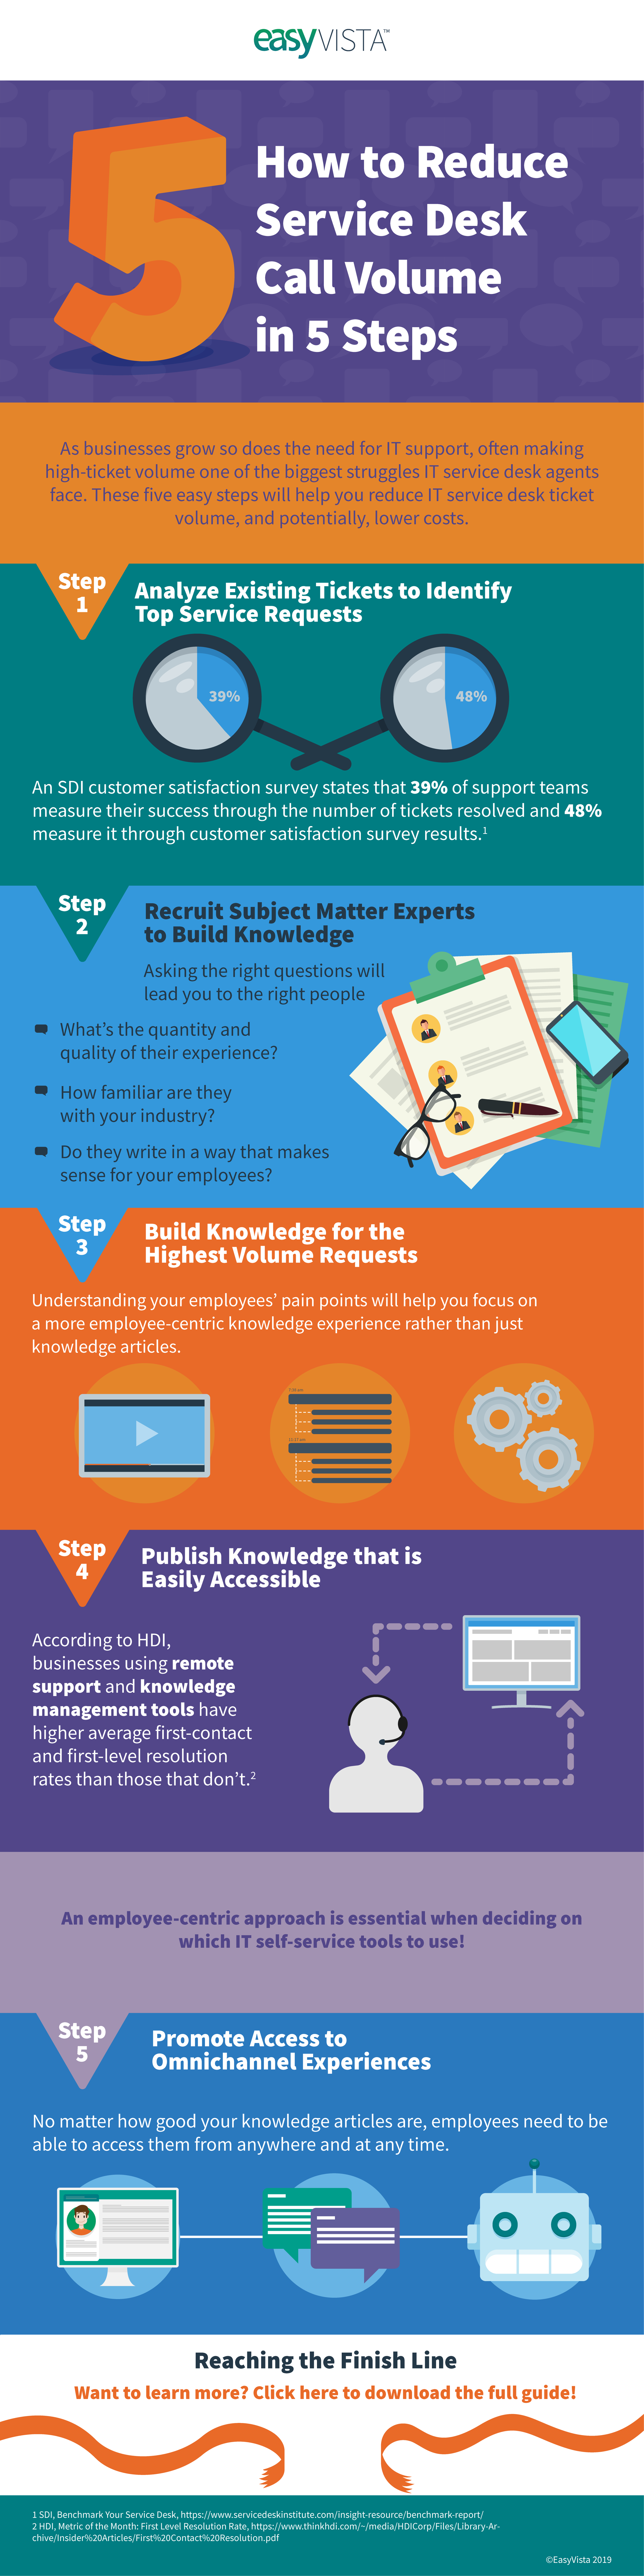 5StepGuide_Infographic_5 Step Infographic - V3